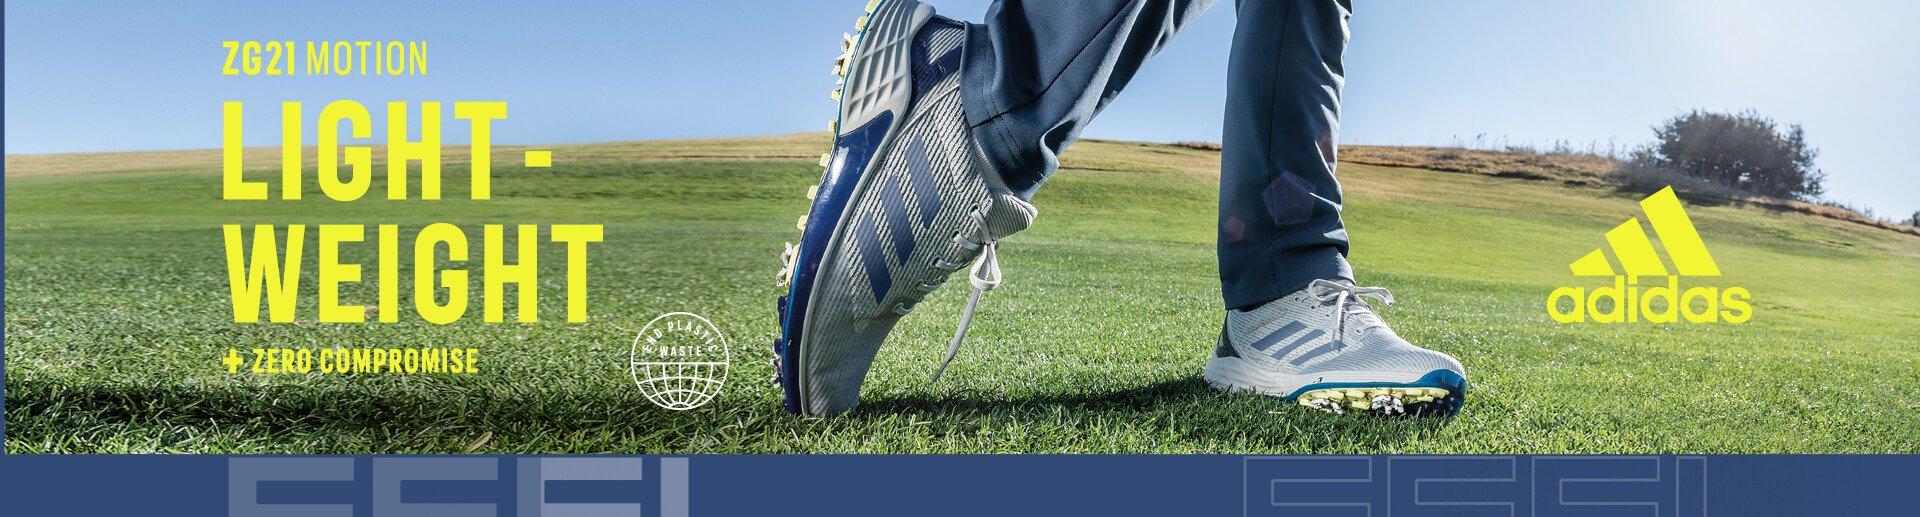 Adidas ZG21 Motion Golf Shoes